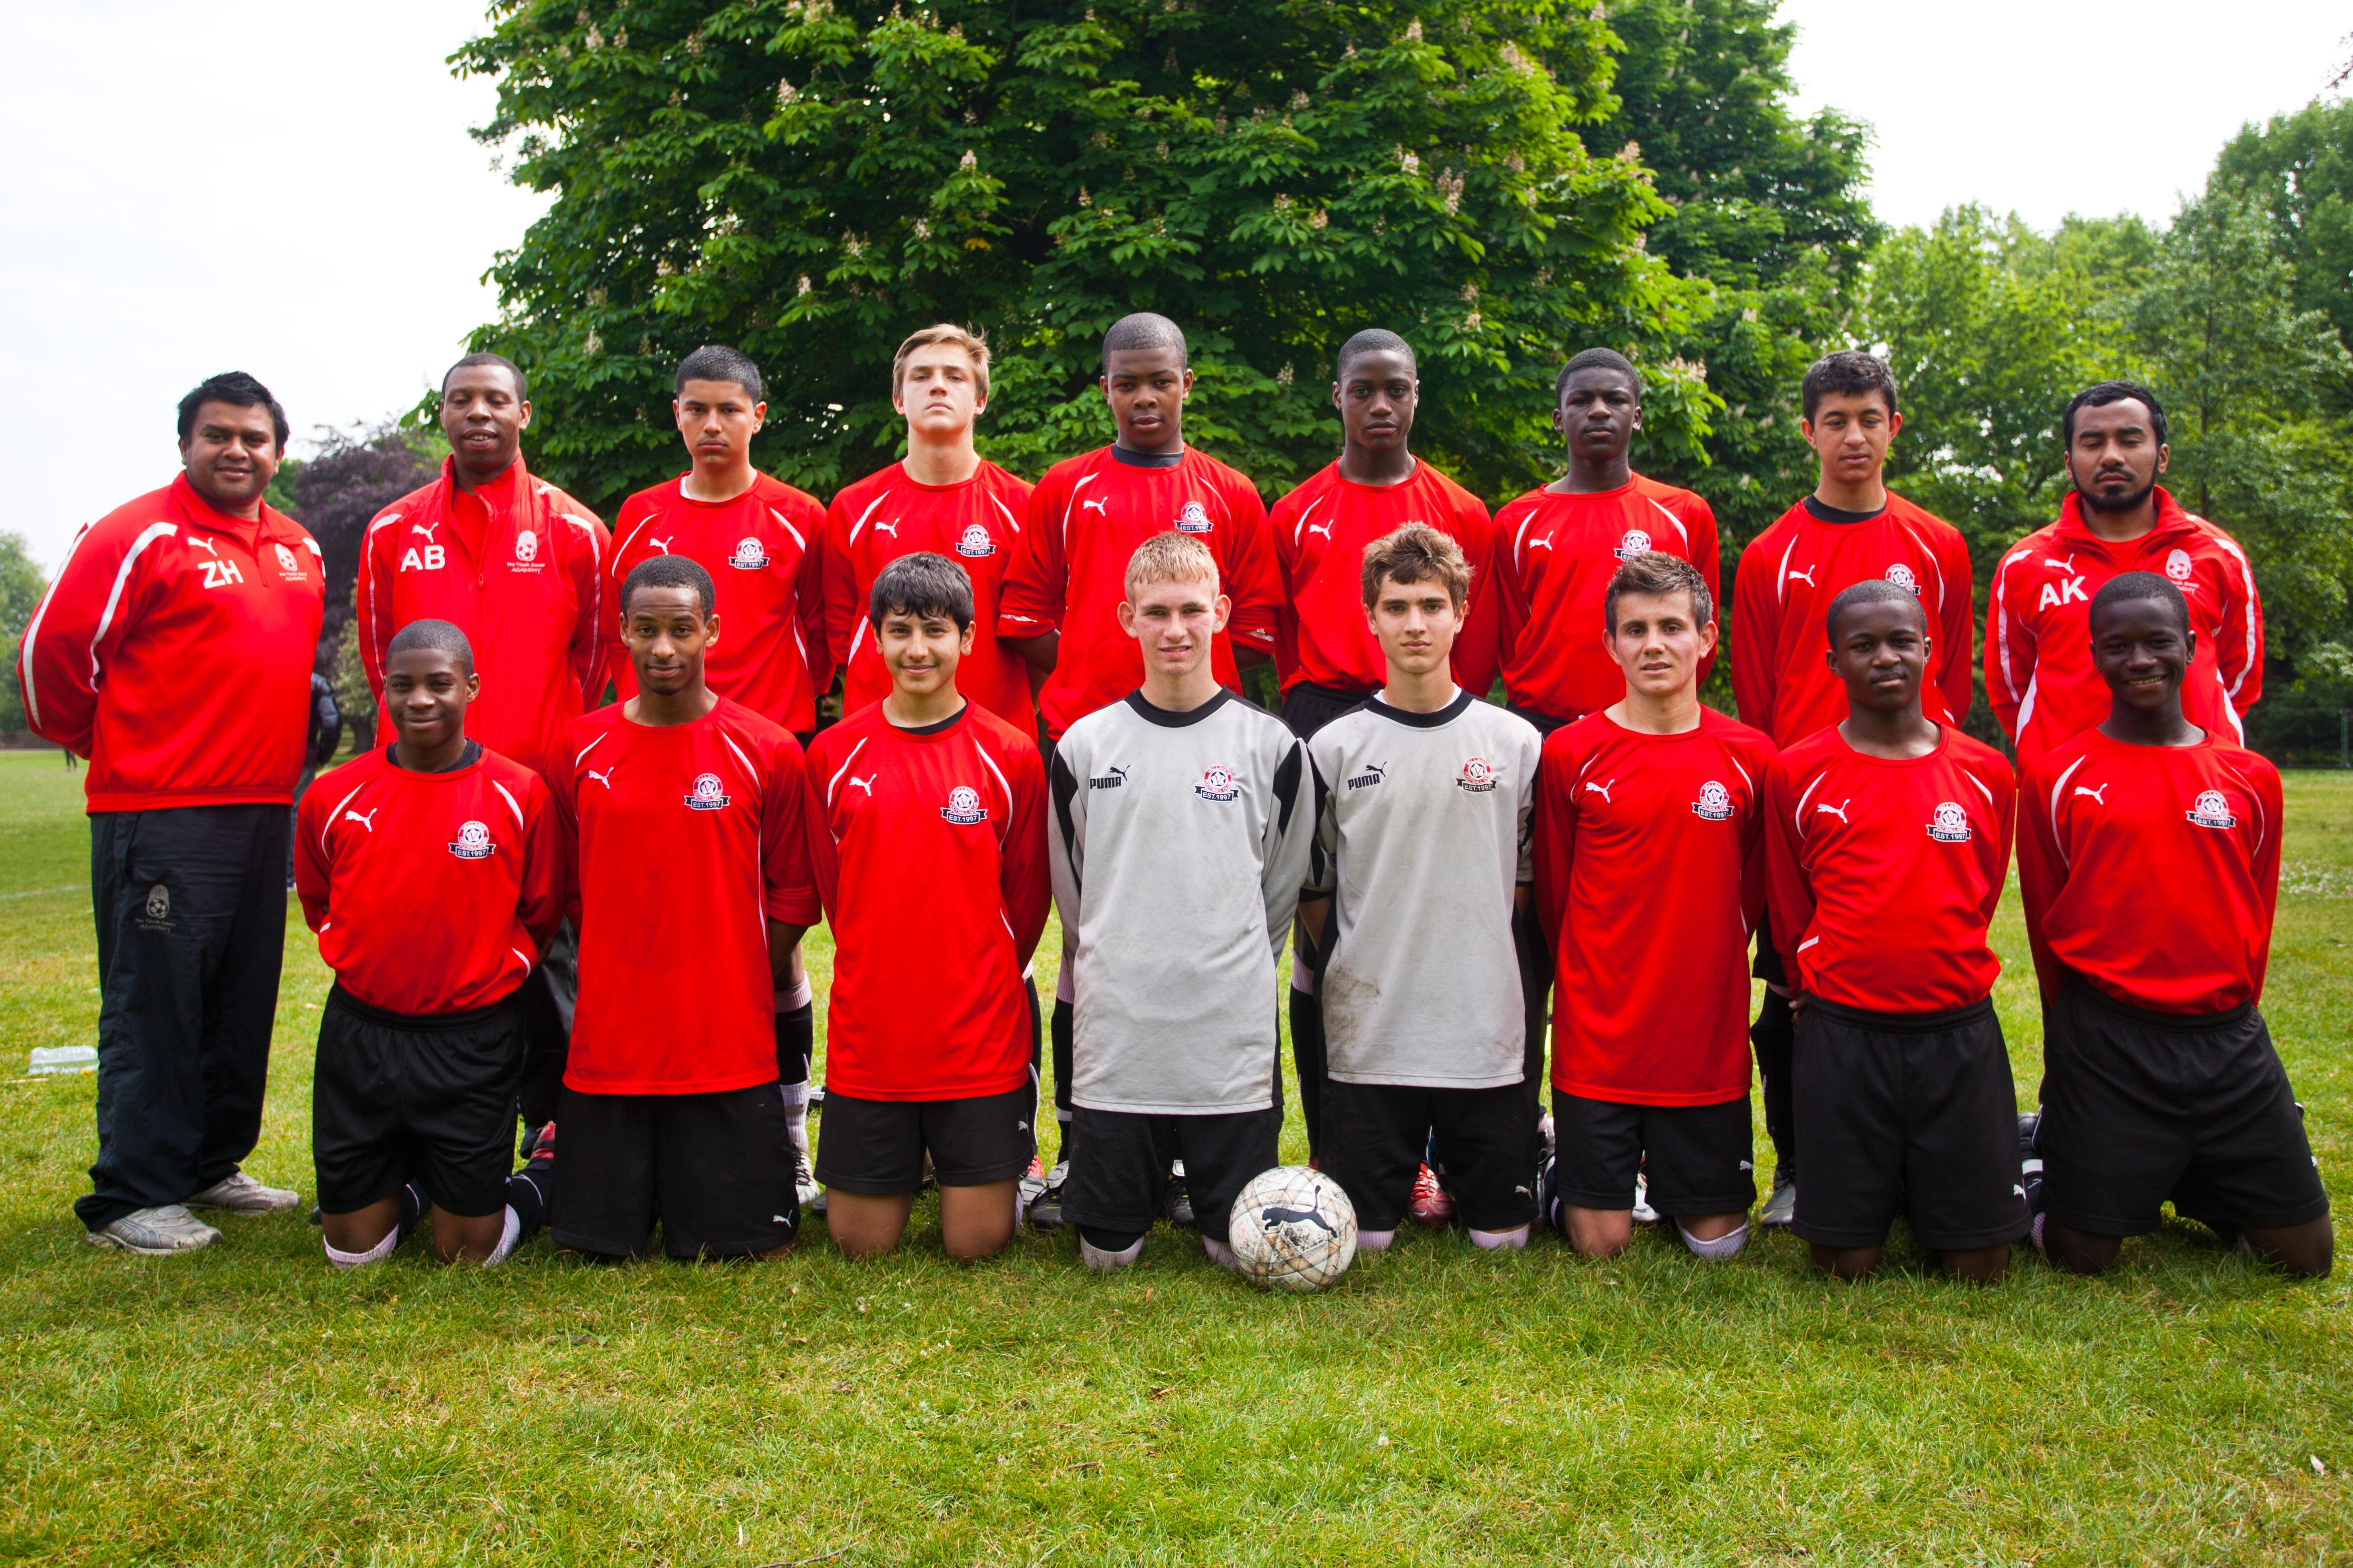 VFC U16 Mayors Cup squad 2011.jpg